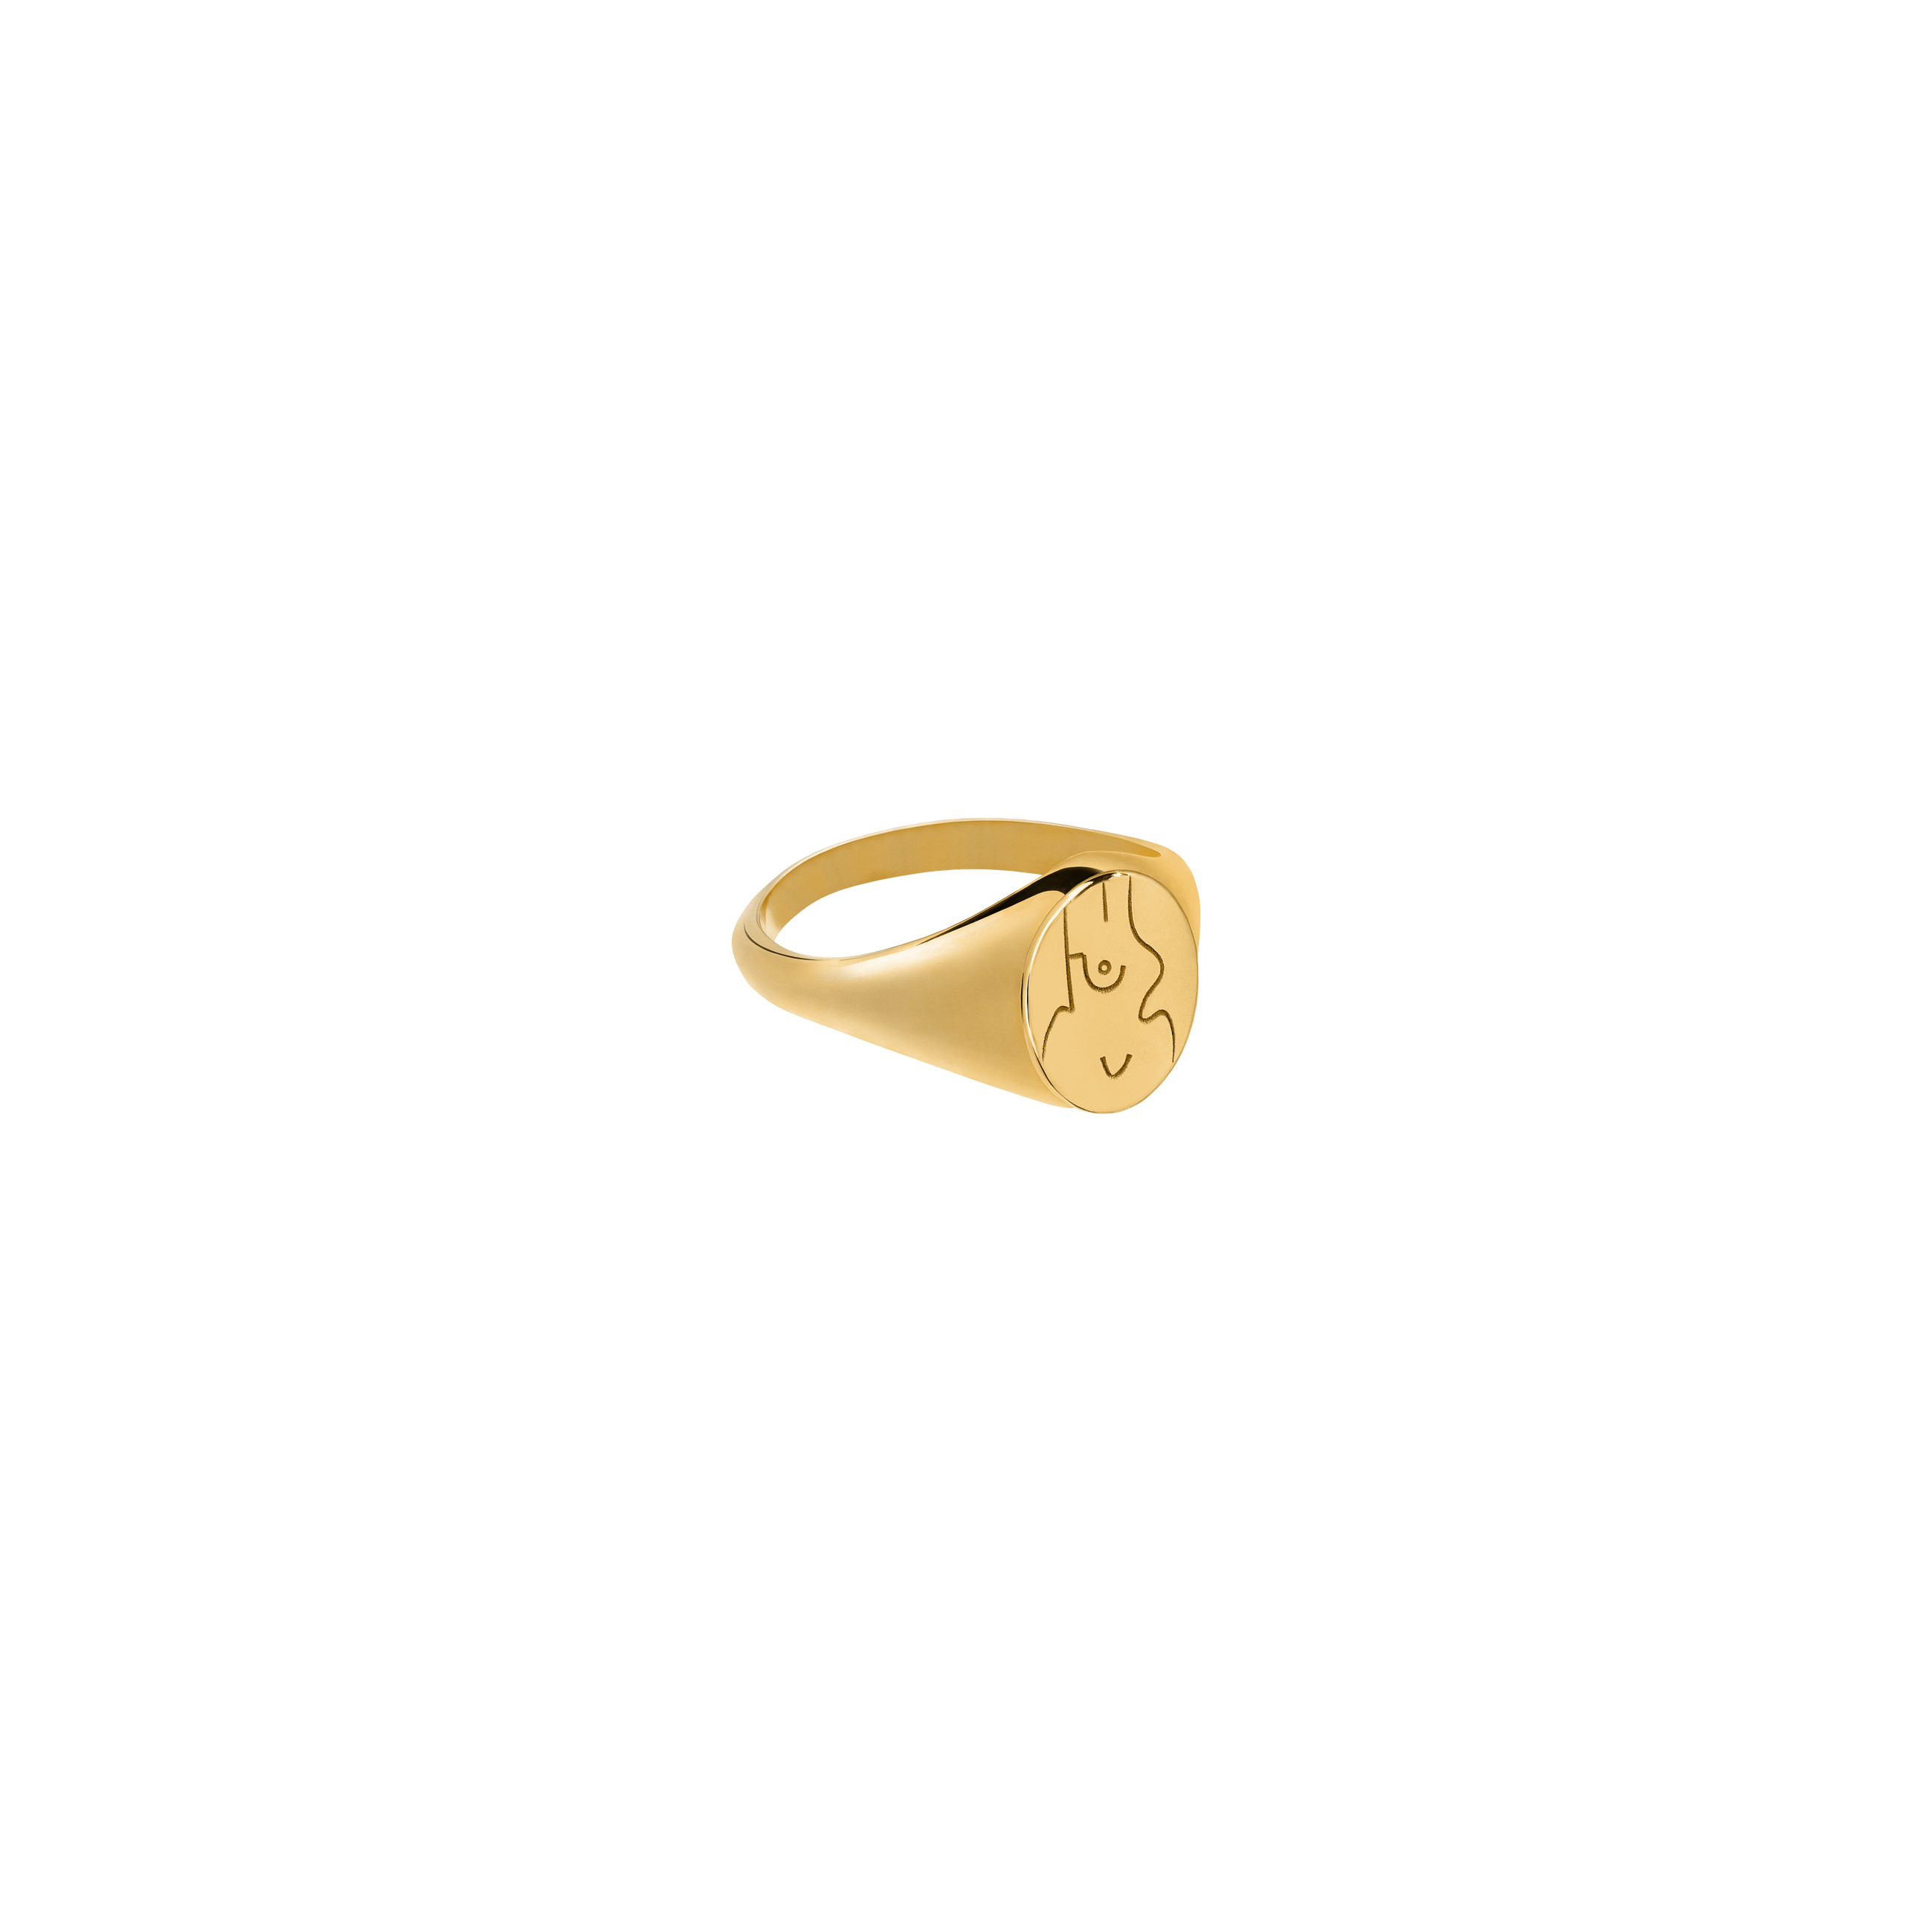 Sygnet Féminin Gold